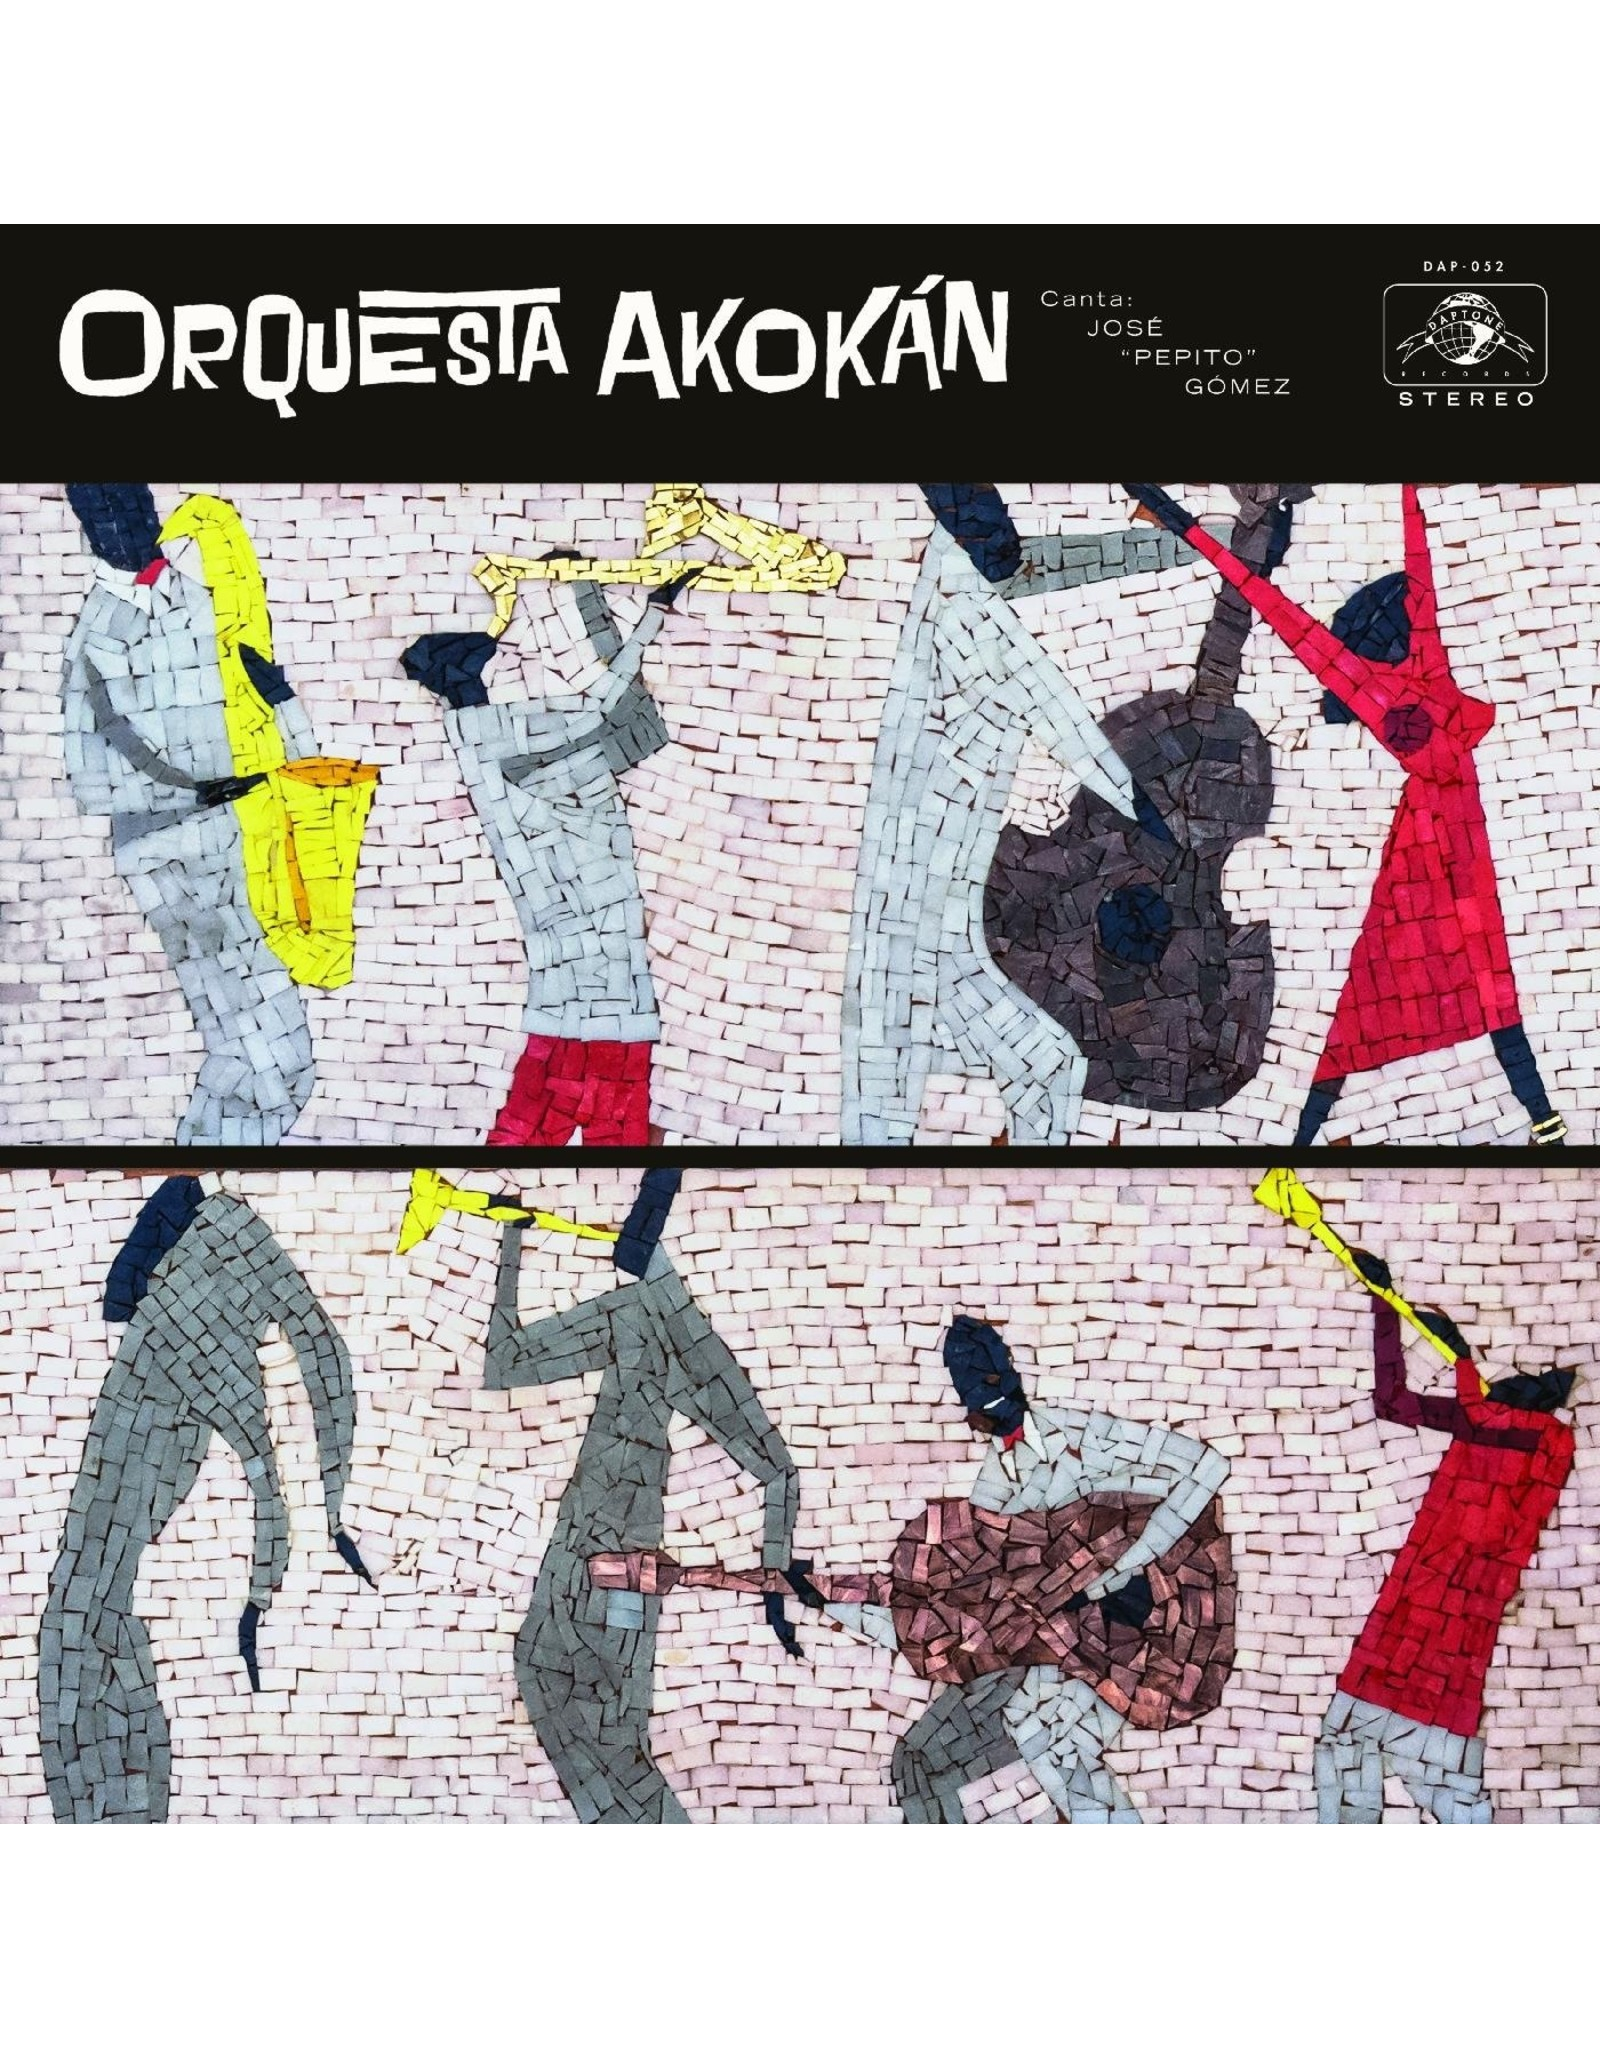 New Vinyl Orquesta Akokan - S/T LP